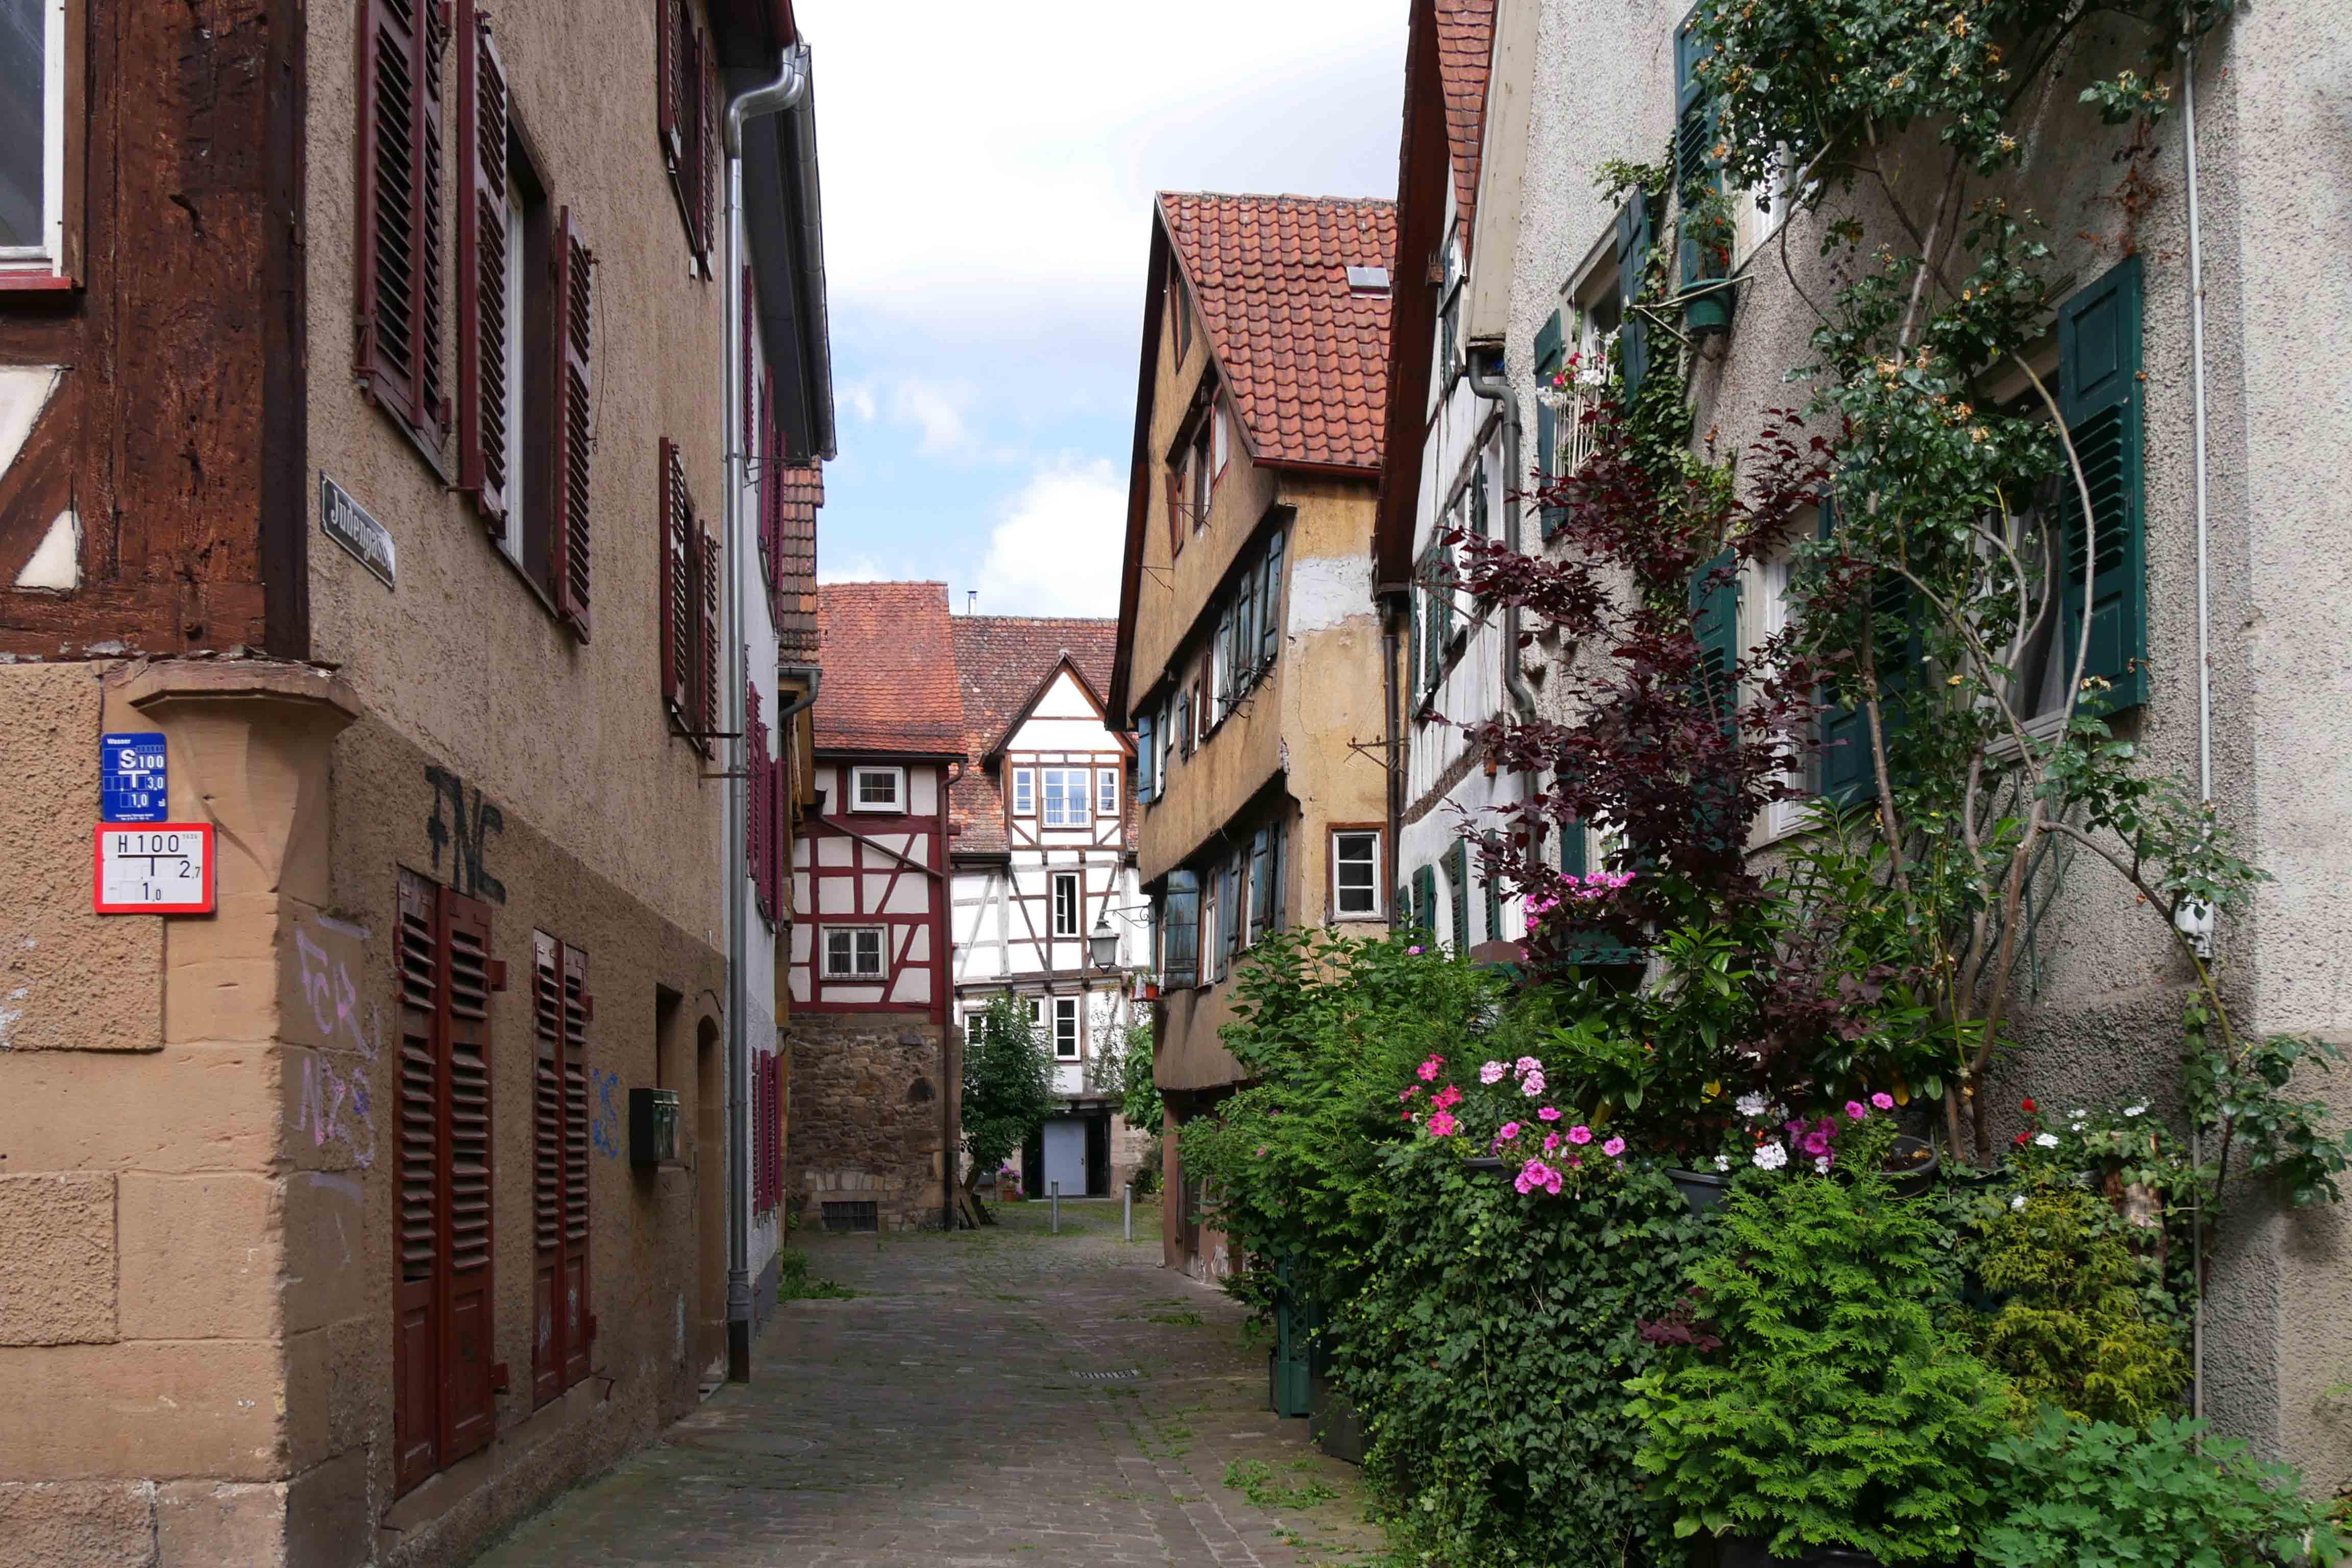 Jüdisches Leben in Tübingen